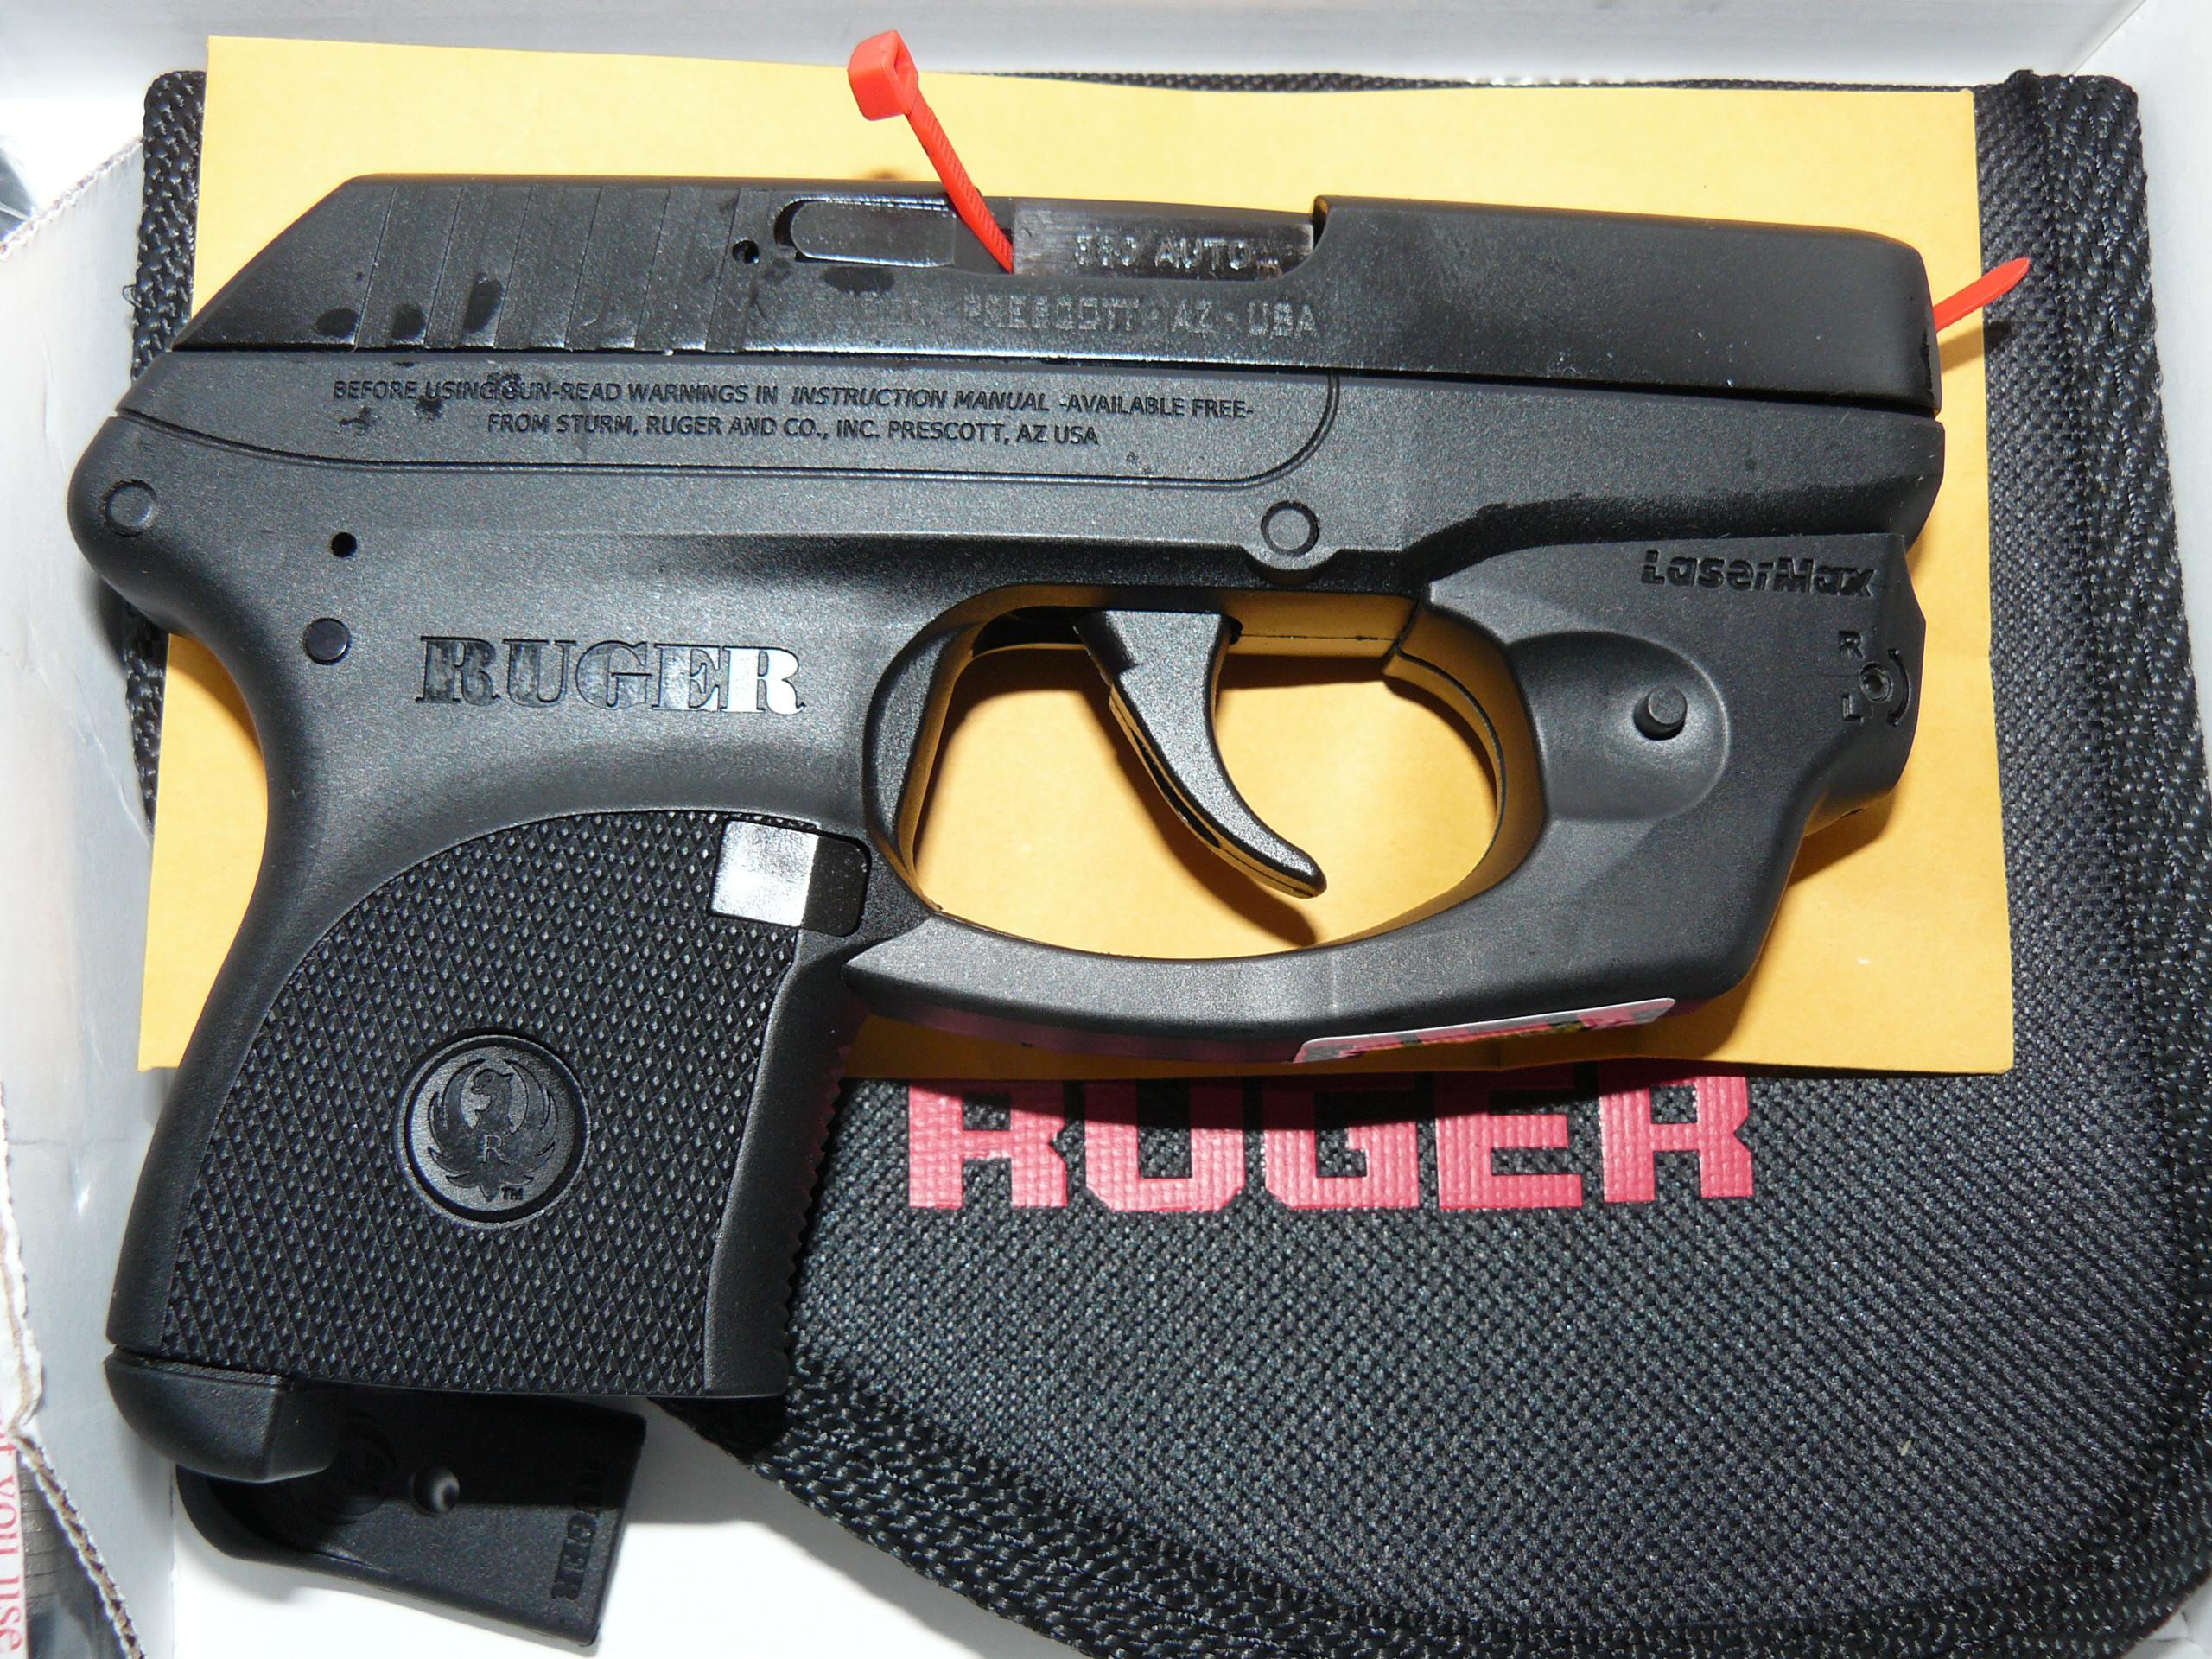 3561283.jpg. /UserImages/118031/949933148 3561283.jpg. Description: Ruger LCP 380 with LaserMax Laser.